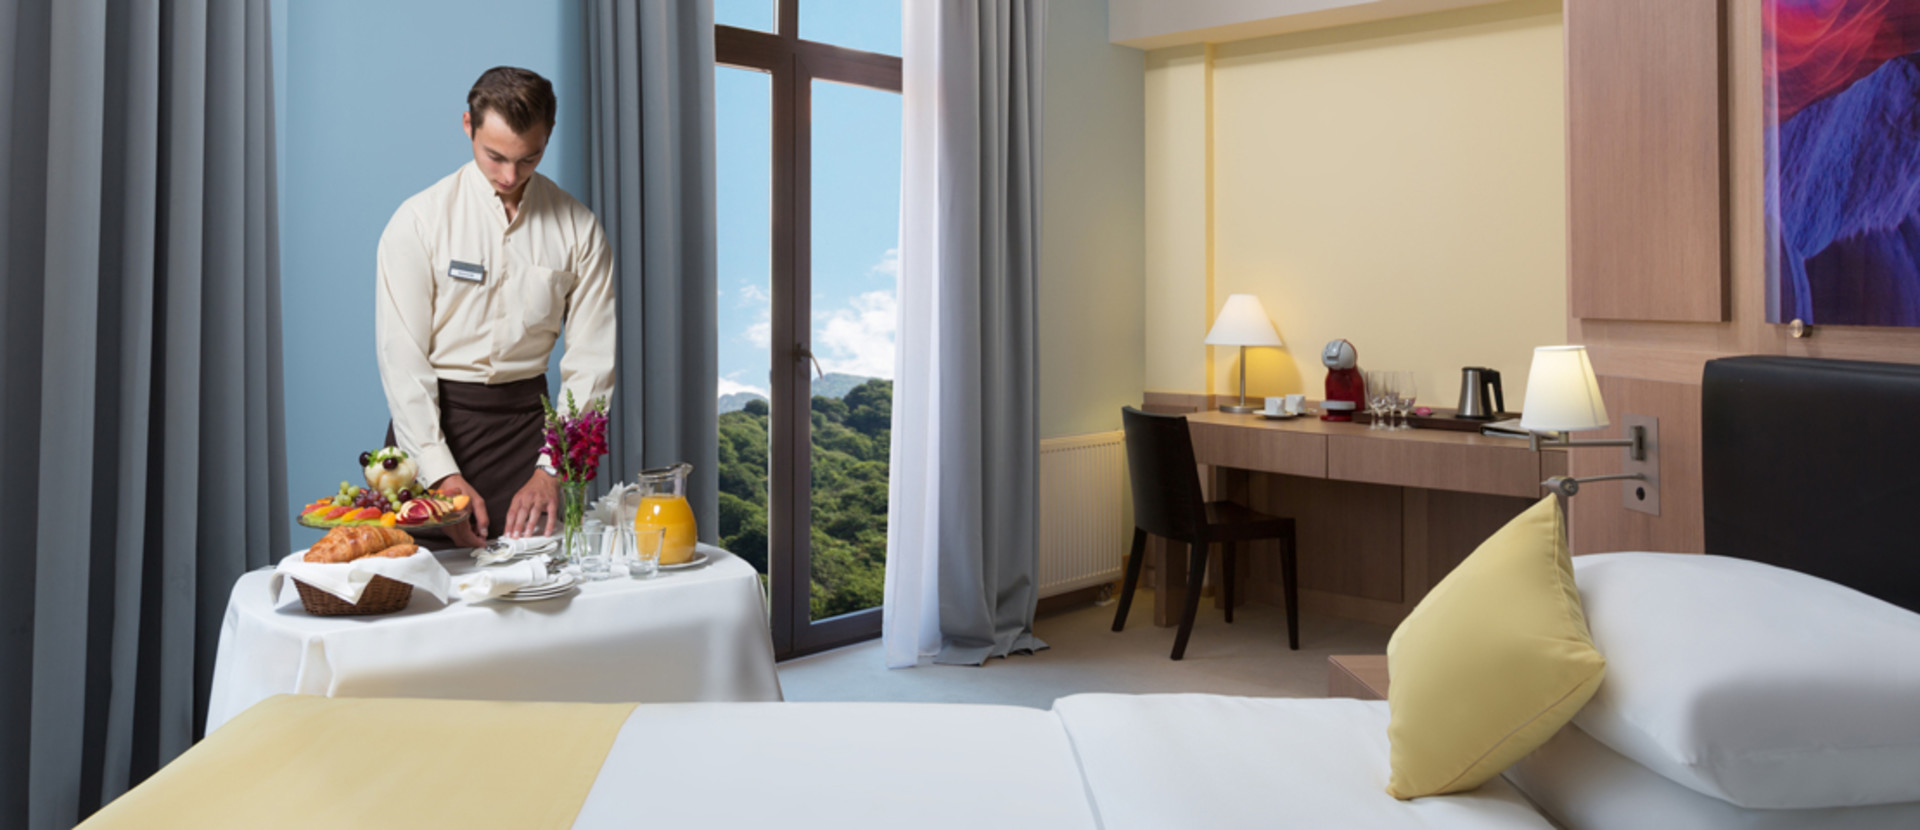 Room-service.jpg